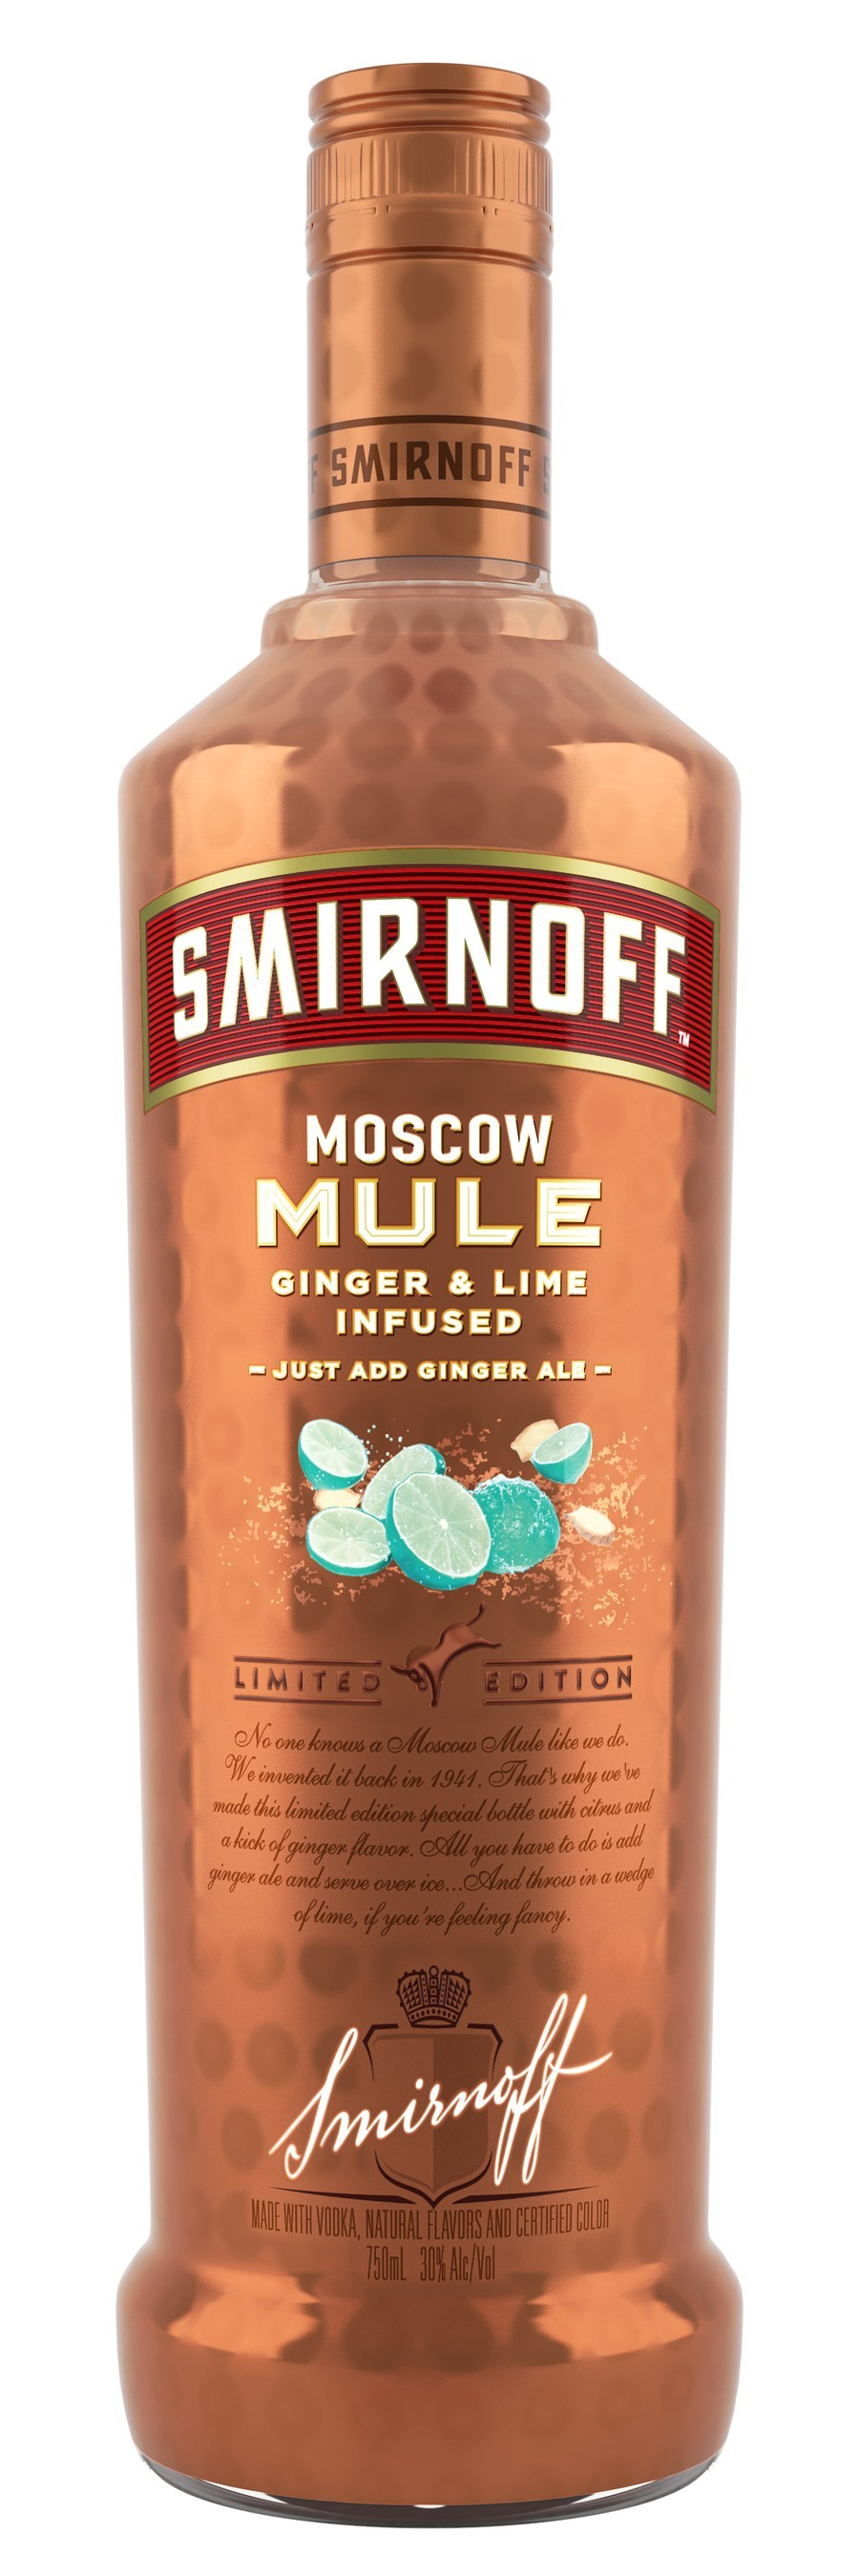 Smirnoff Vodka Reinvents The Moscow